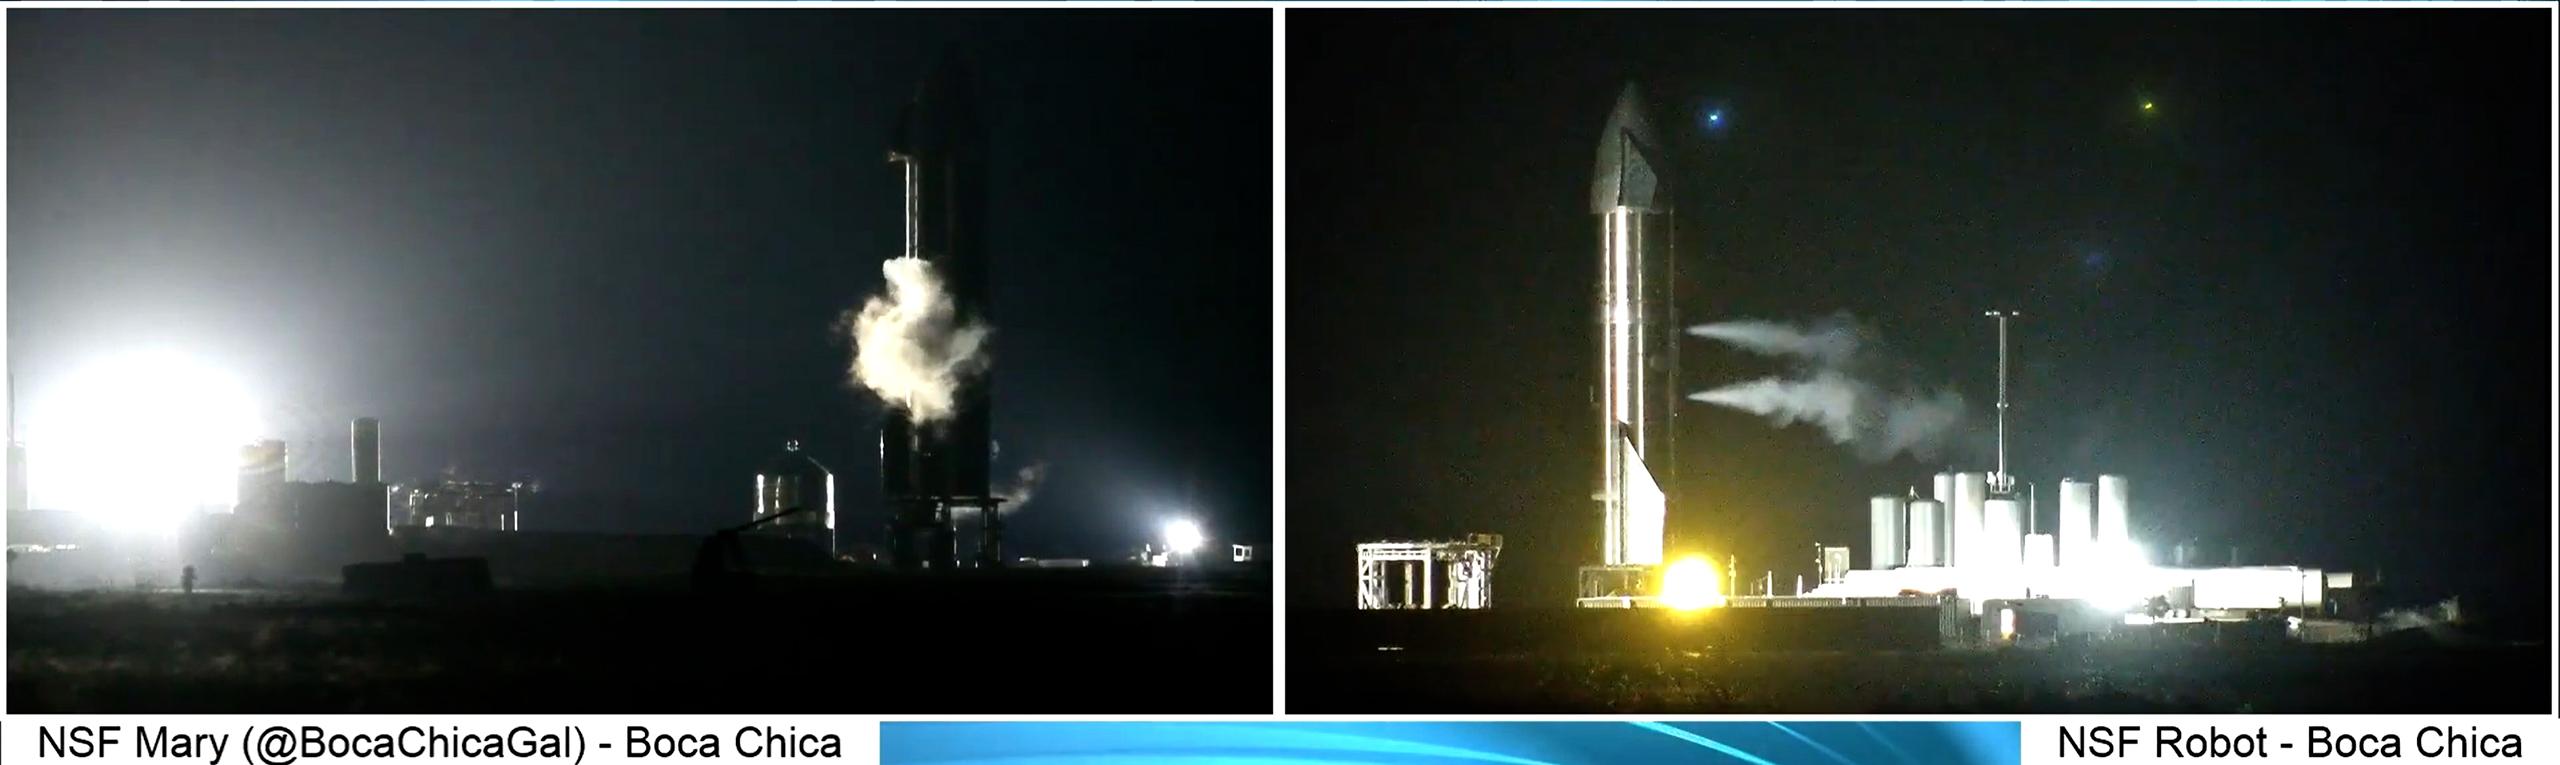 Starship Boca Chica 012021 (NASASpaceflight – bocachicagal) SN9 static fire aborts 1 (c)